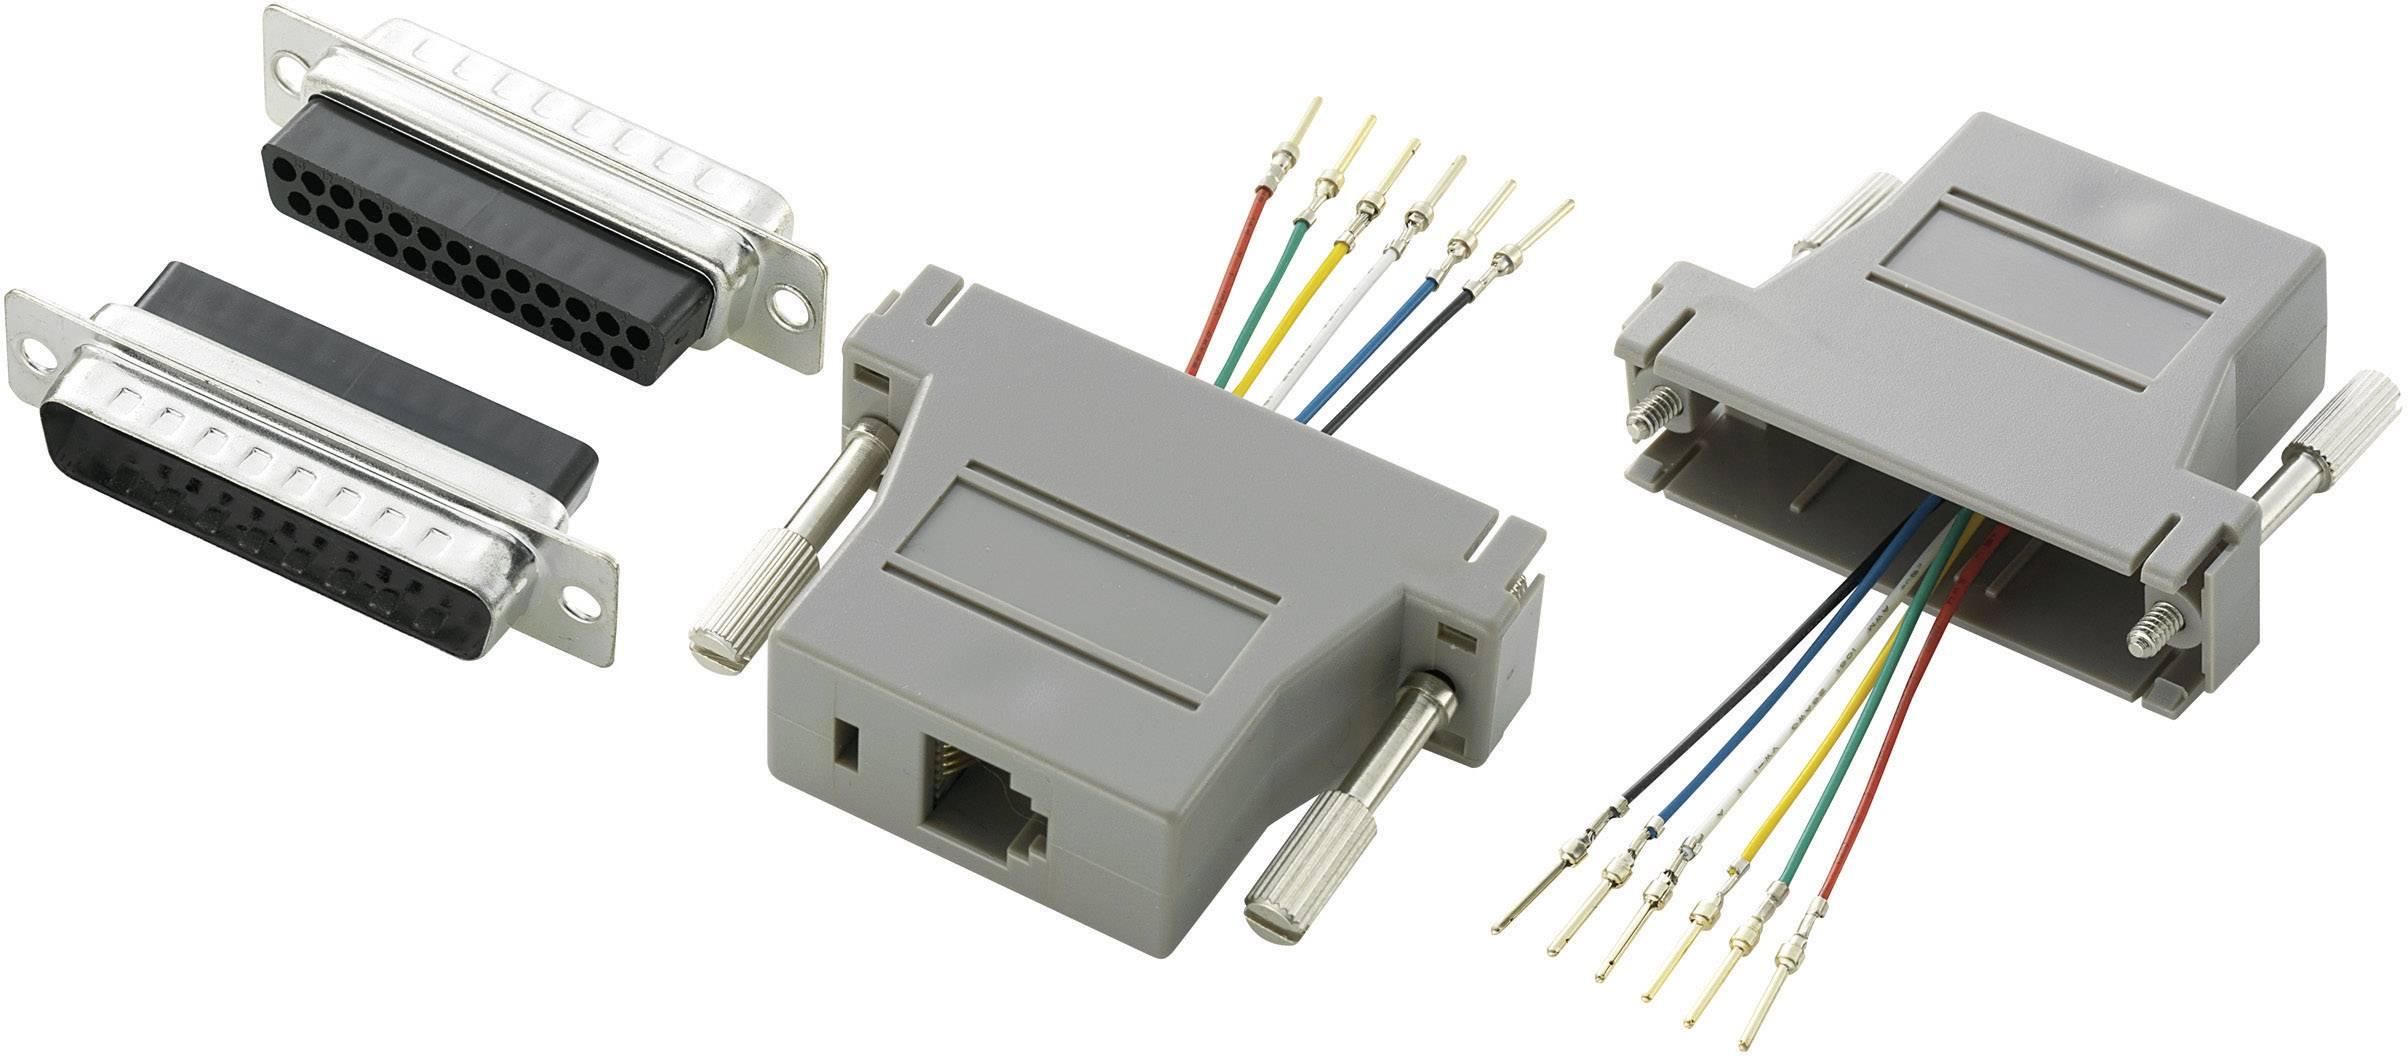 D-SUB adaptér Conrad Components počet pinov 25, 1 ks